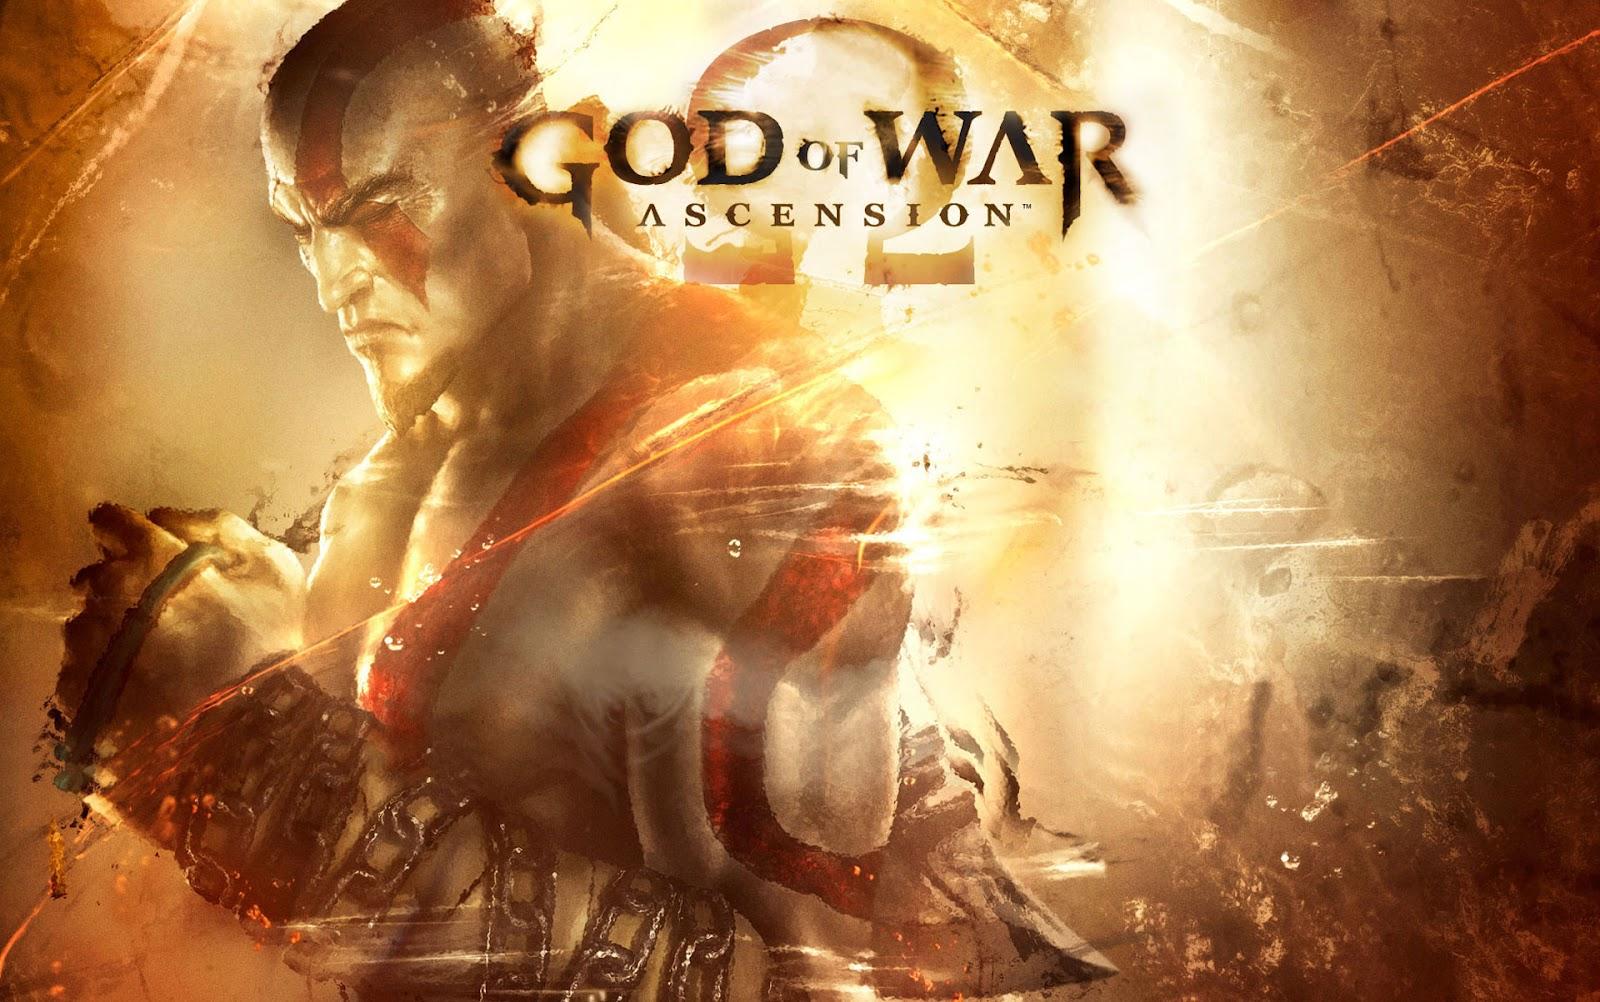 http://4.bp.blogspot.com/-0-P5aCMnp2Q/UAcHMtfftgI/AAAAAAAABLY/kiXXmabiUFY/s1600/God+of+War+Ascension+Wallpaper+2.jpg